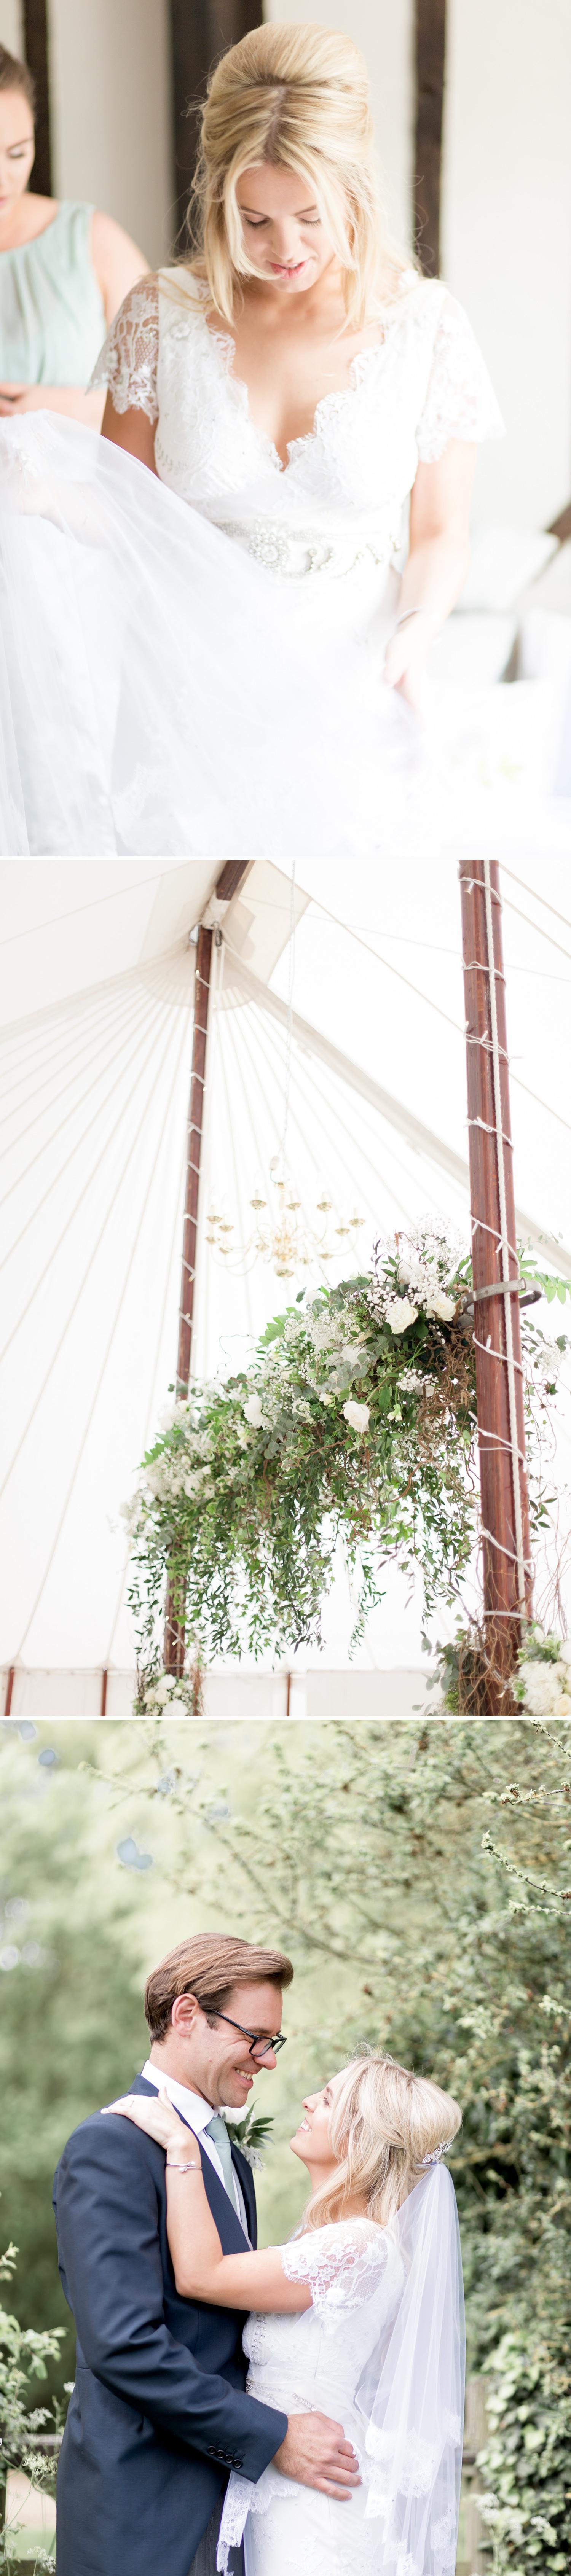 Emily & Jonathan's Cambridgeshire wedding - bride in a beautiful Temperley dress